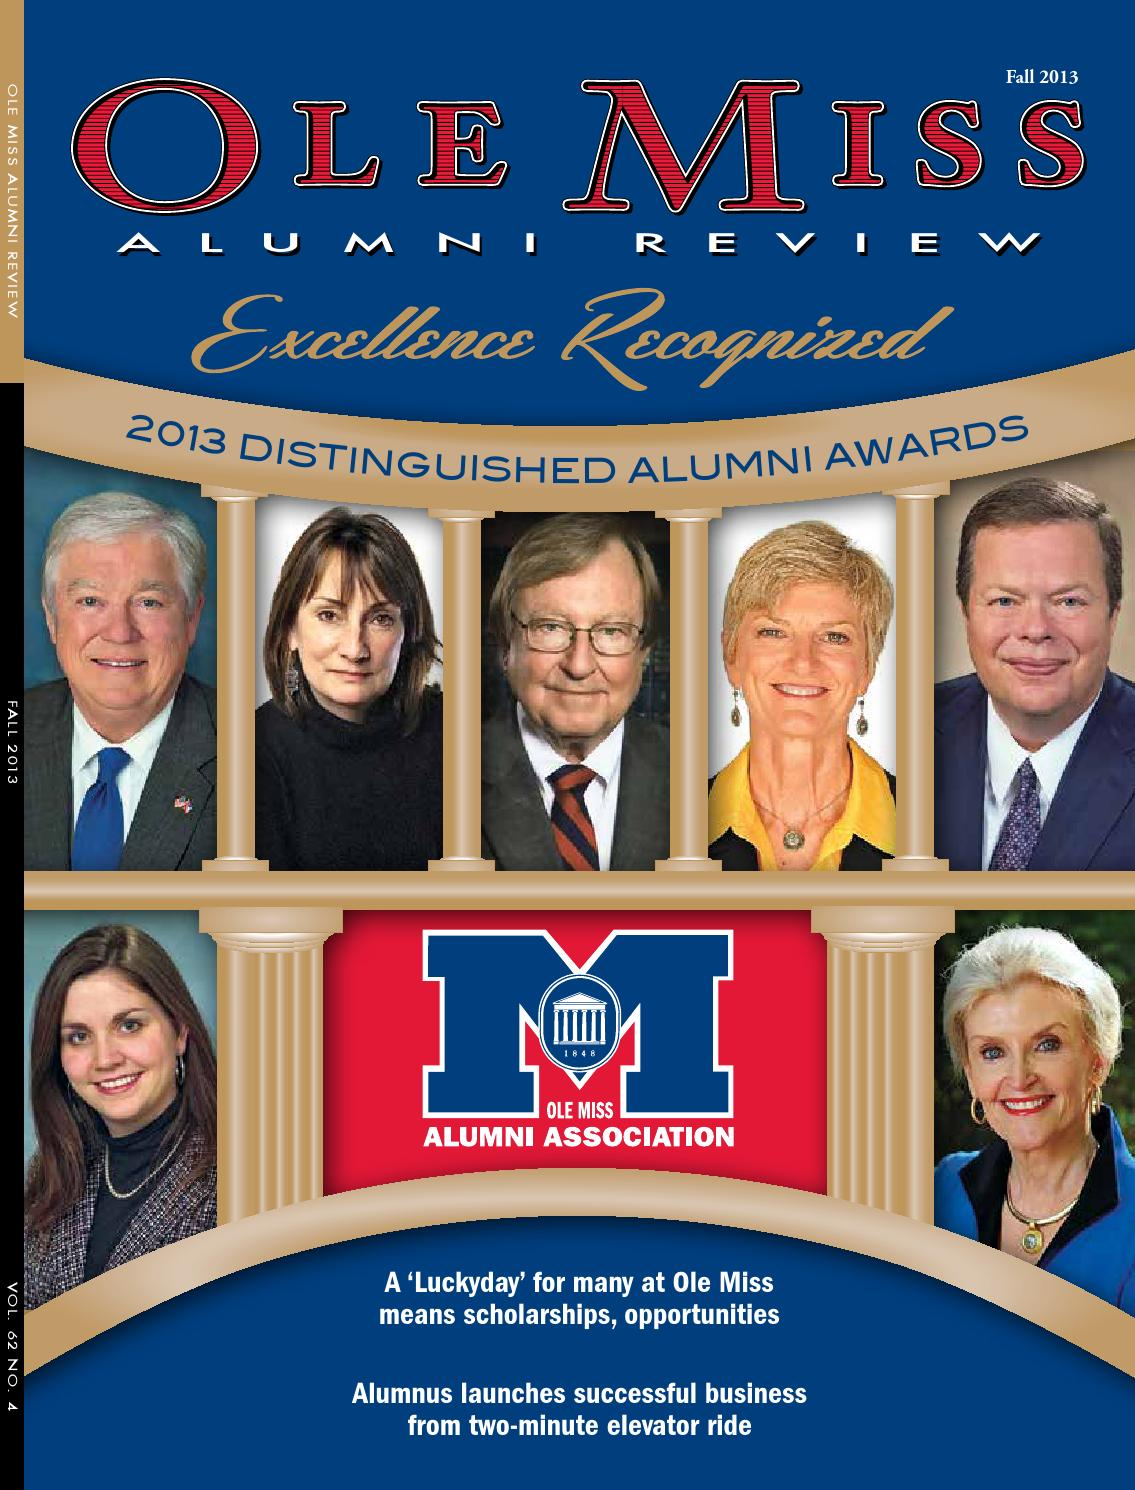 ole miss alumni review fall 2013 by ole miss alumni association issuu ole miss alumni review fall 2013 by